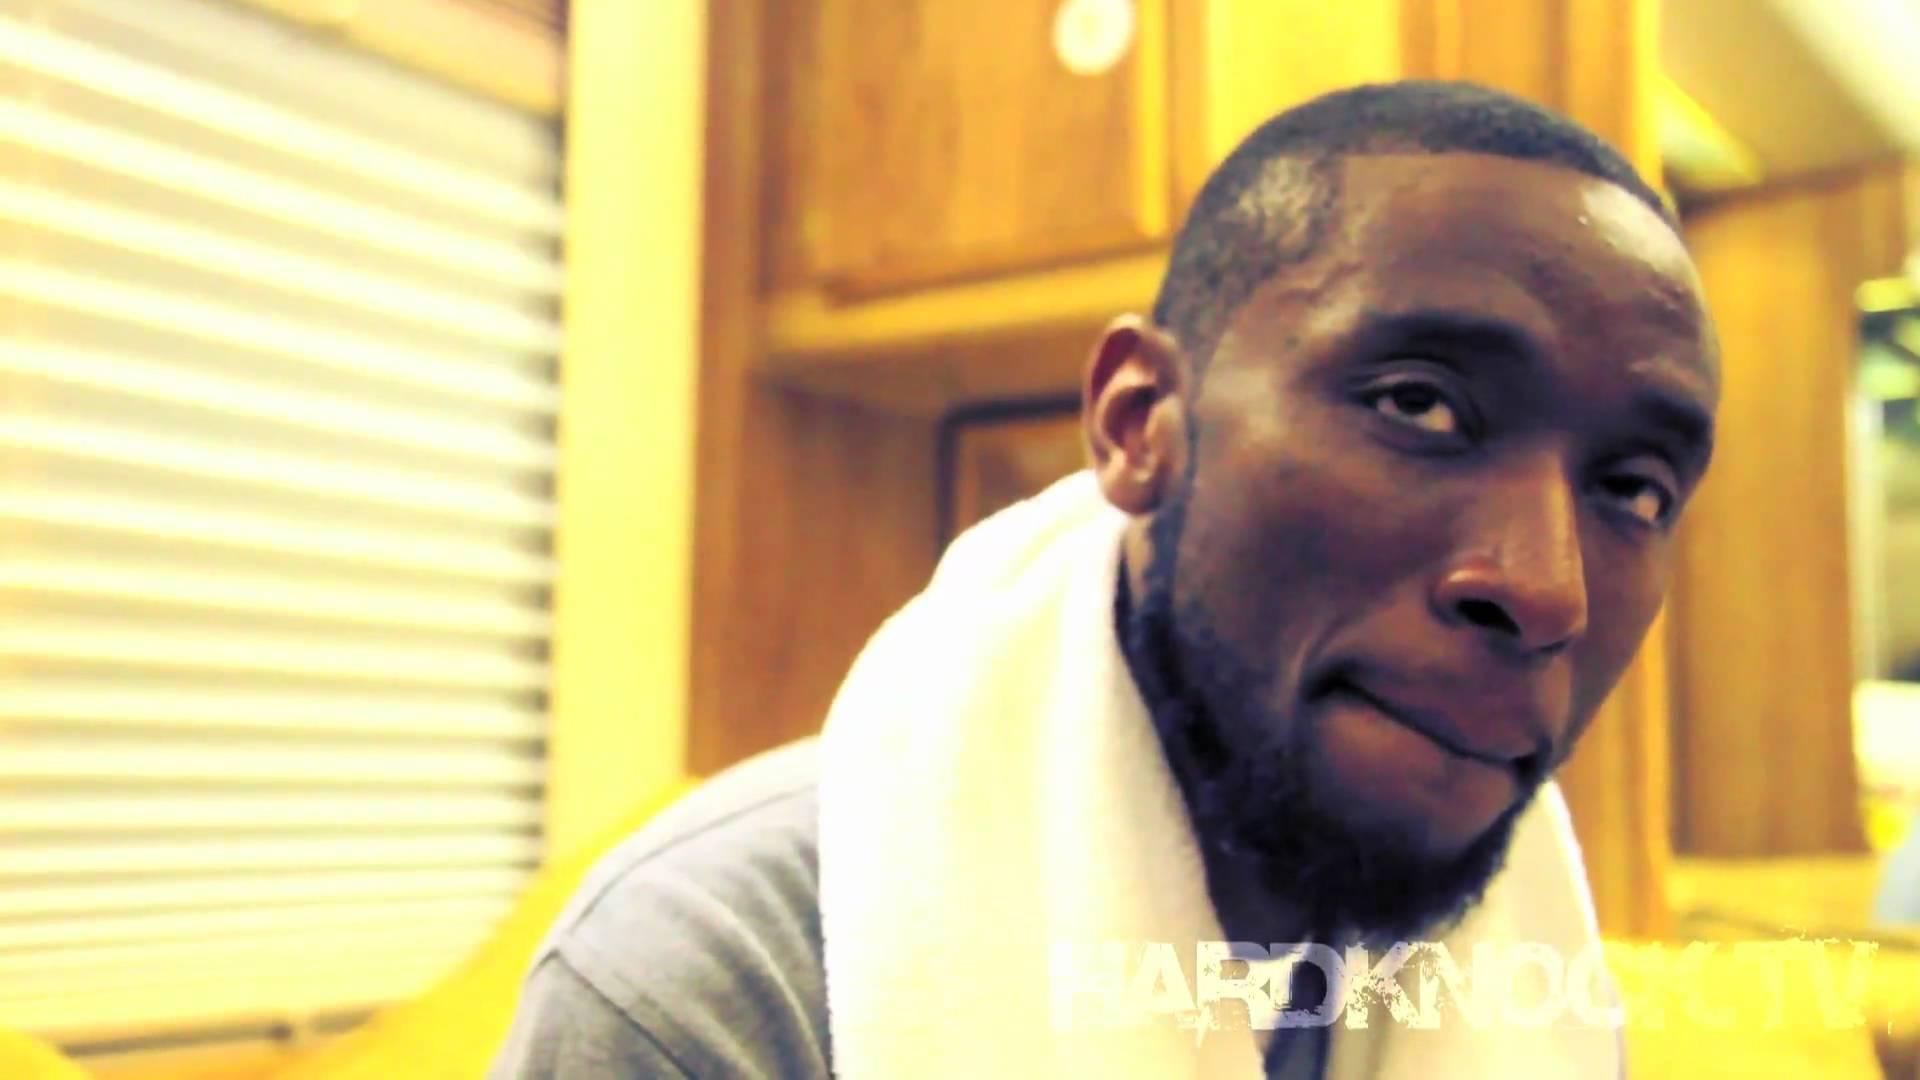 9th Wonder talks Drake, J Dilla and calls Nottz best beat maker right now interview by Nick Huff Barili